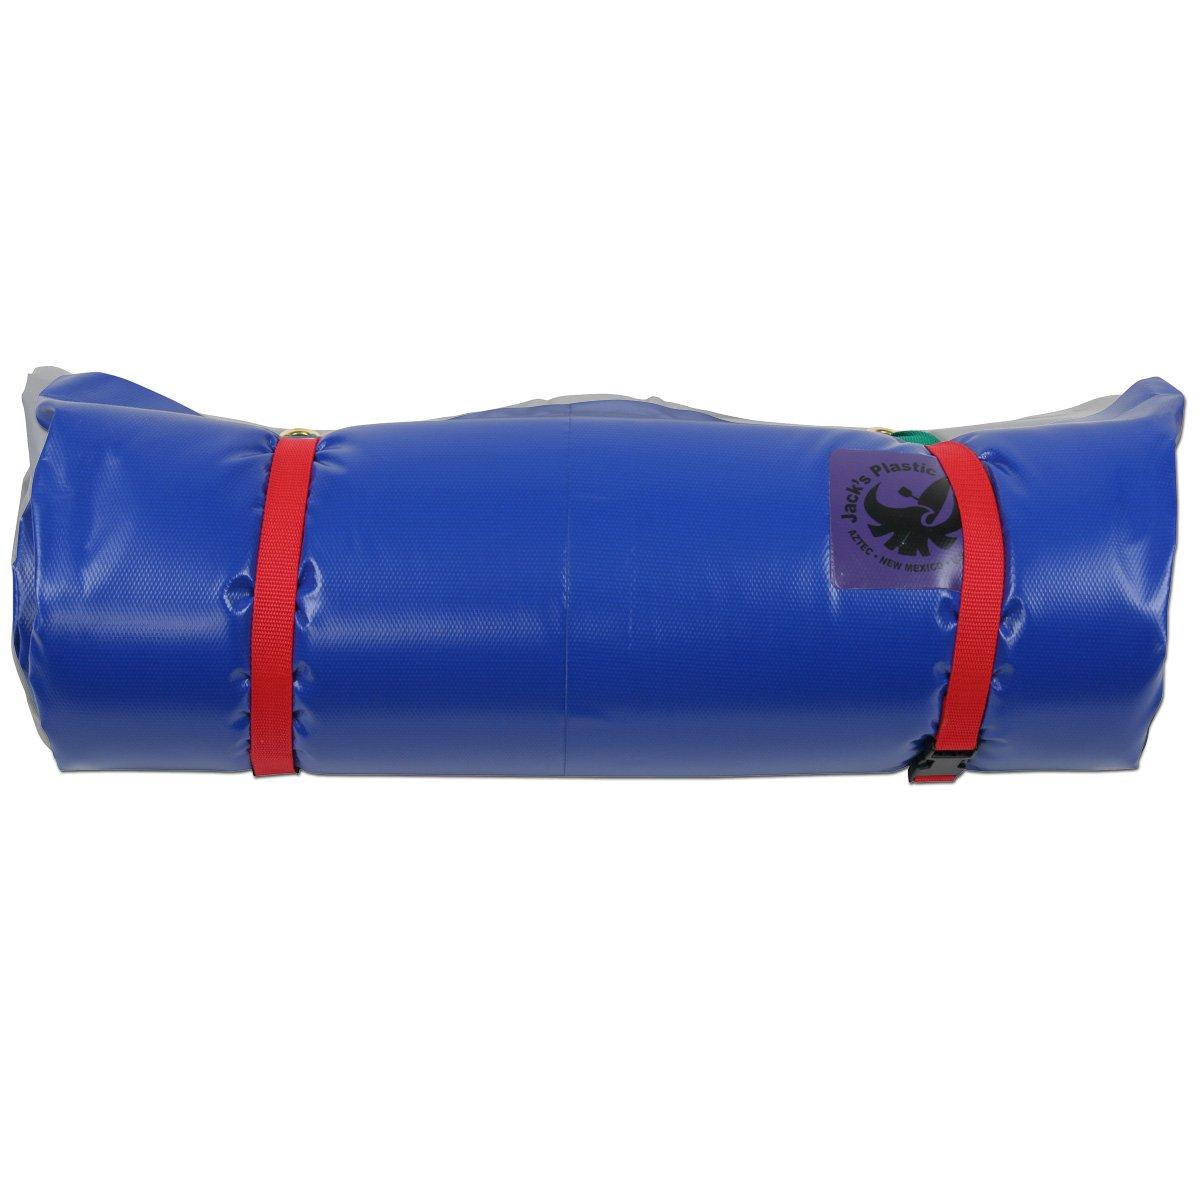 JACK'S PLASTIC Super Paco Sleeping Pad Dark Blue One Size